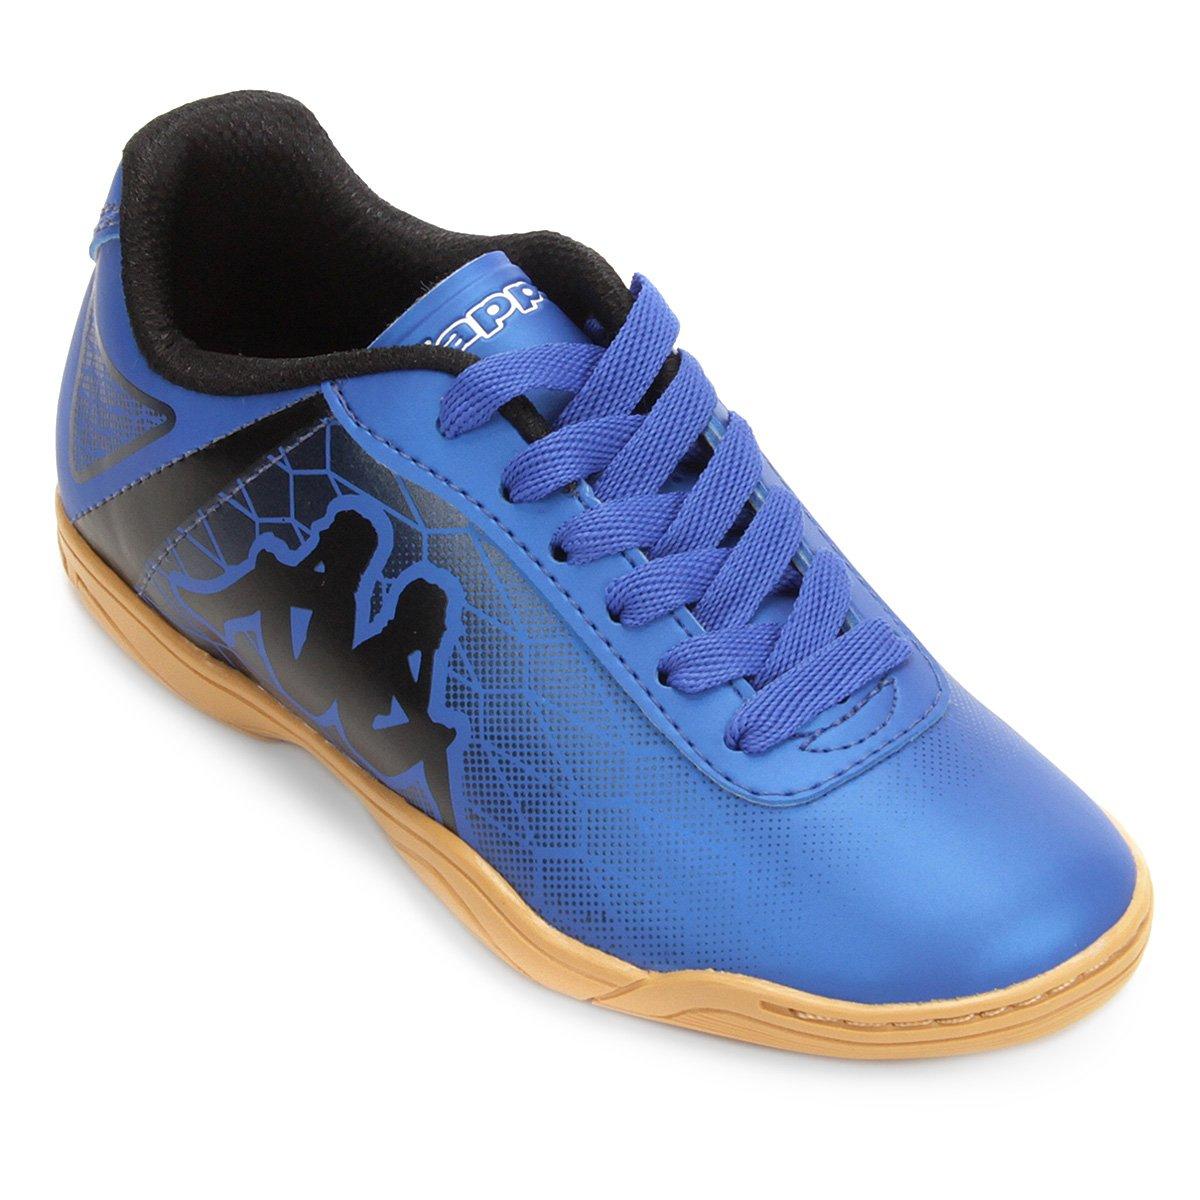 5a8db8d9a0 Chuteira Futsal Infantil Kappa Torpedo